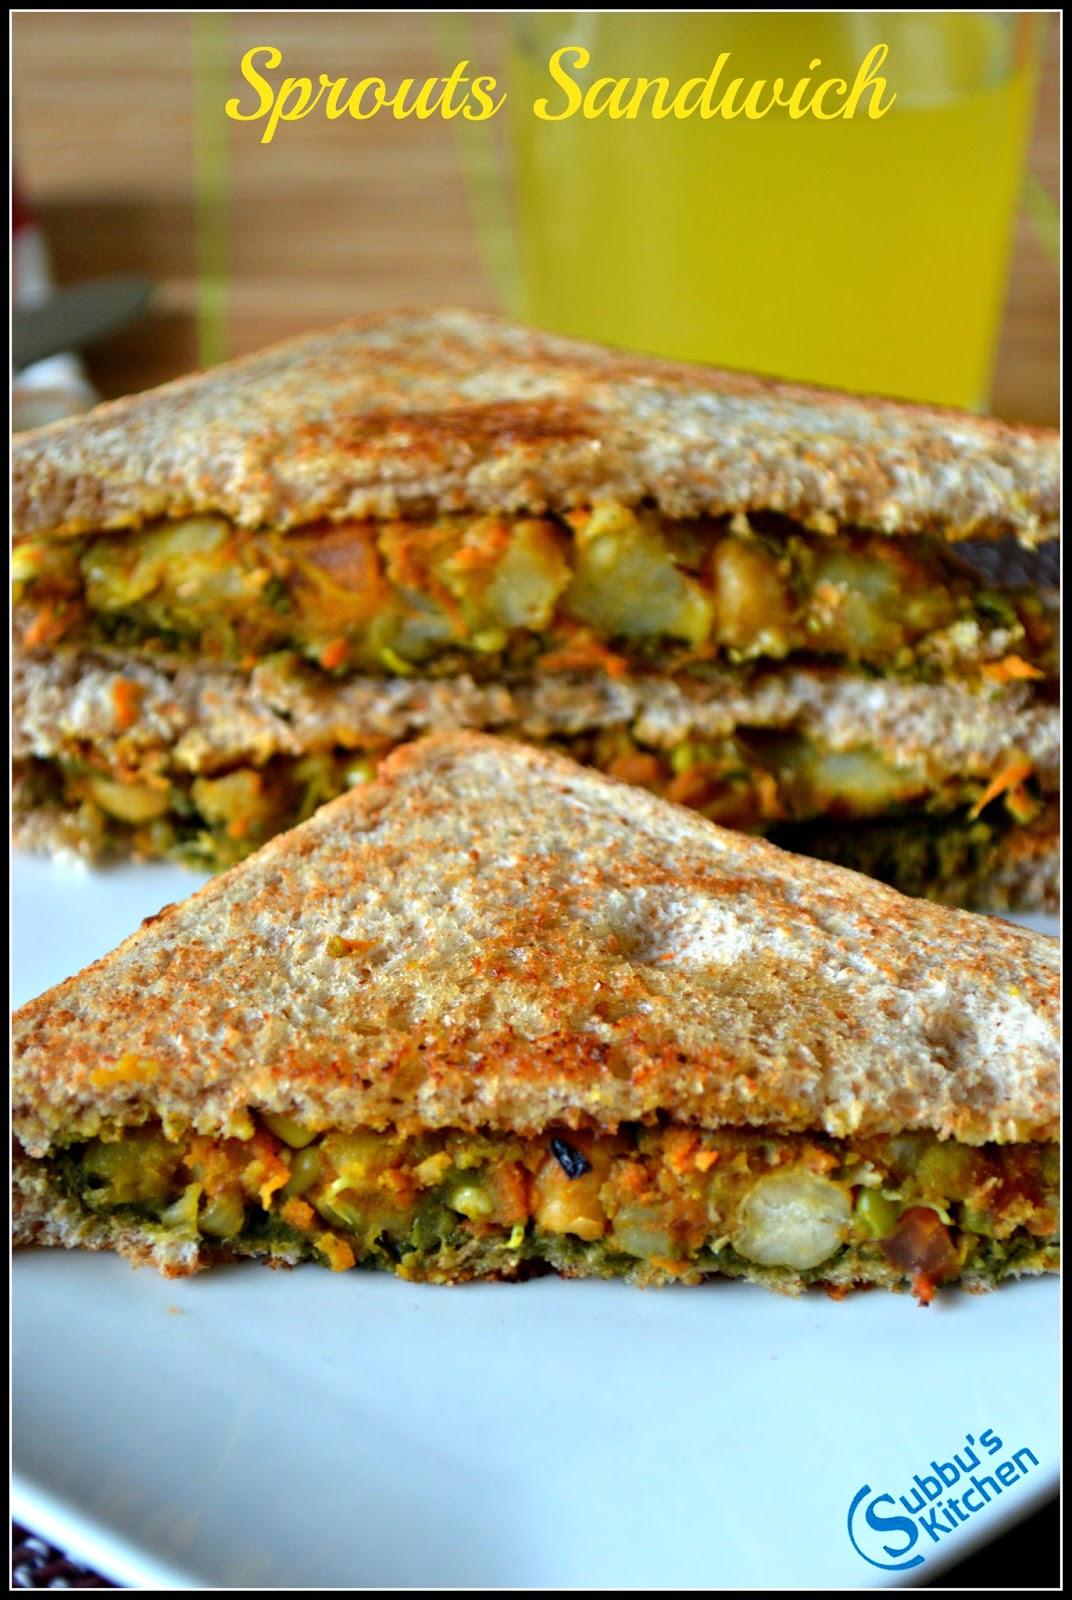 Sprouts Masala Sandwich